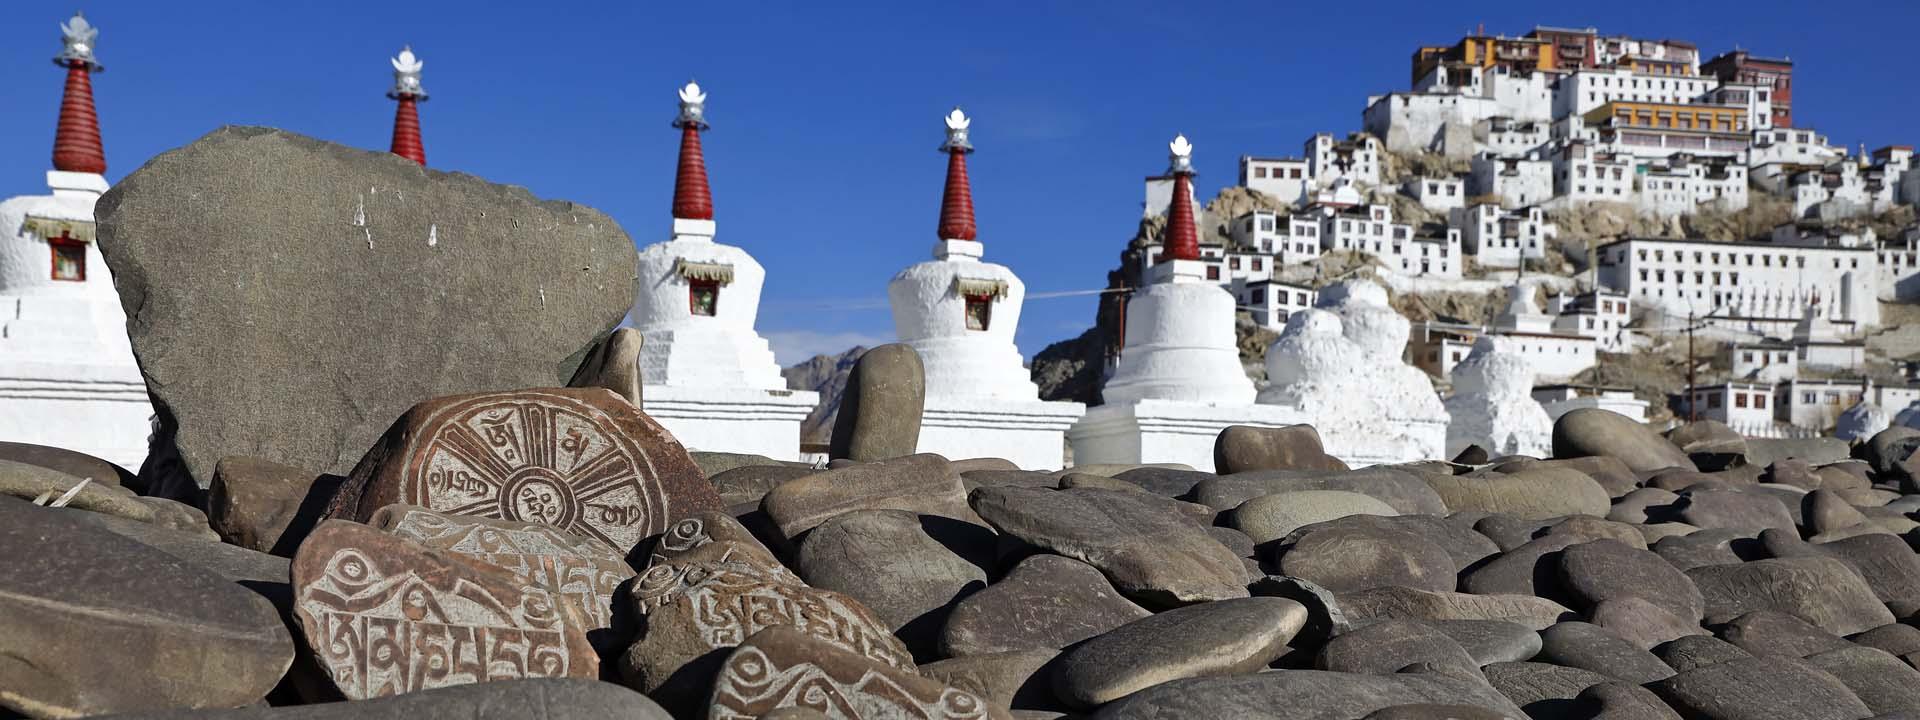 Kloster Thiksey in Ladakh Indien